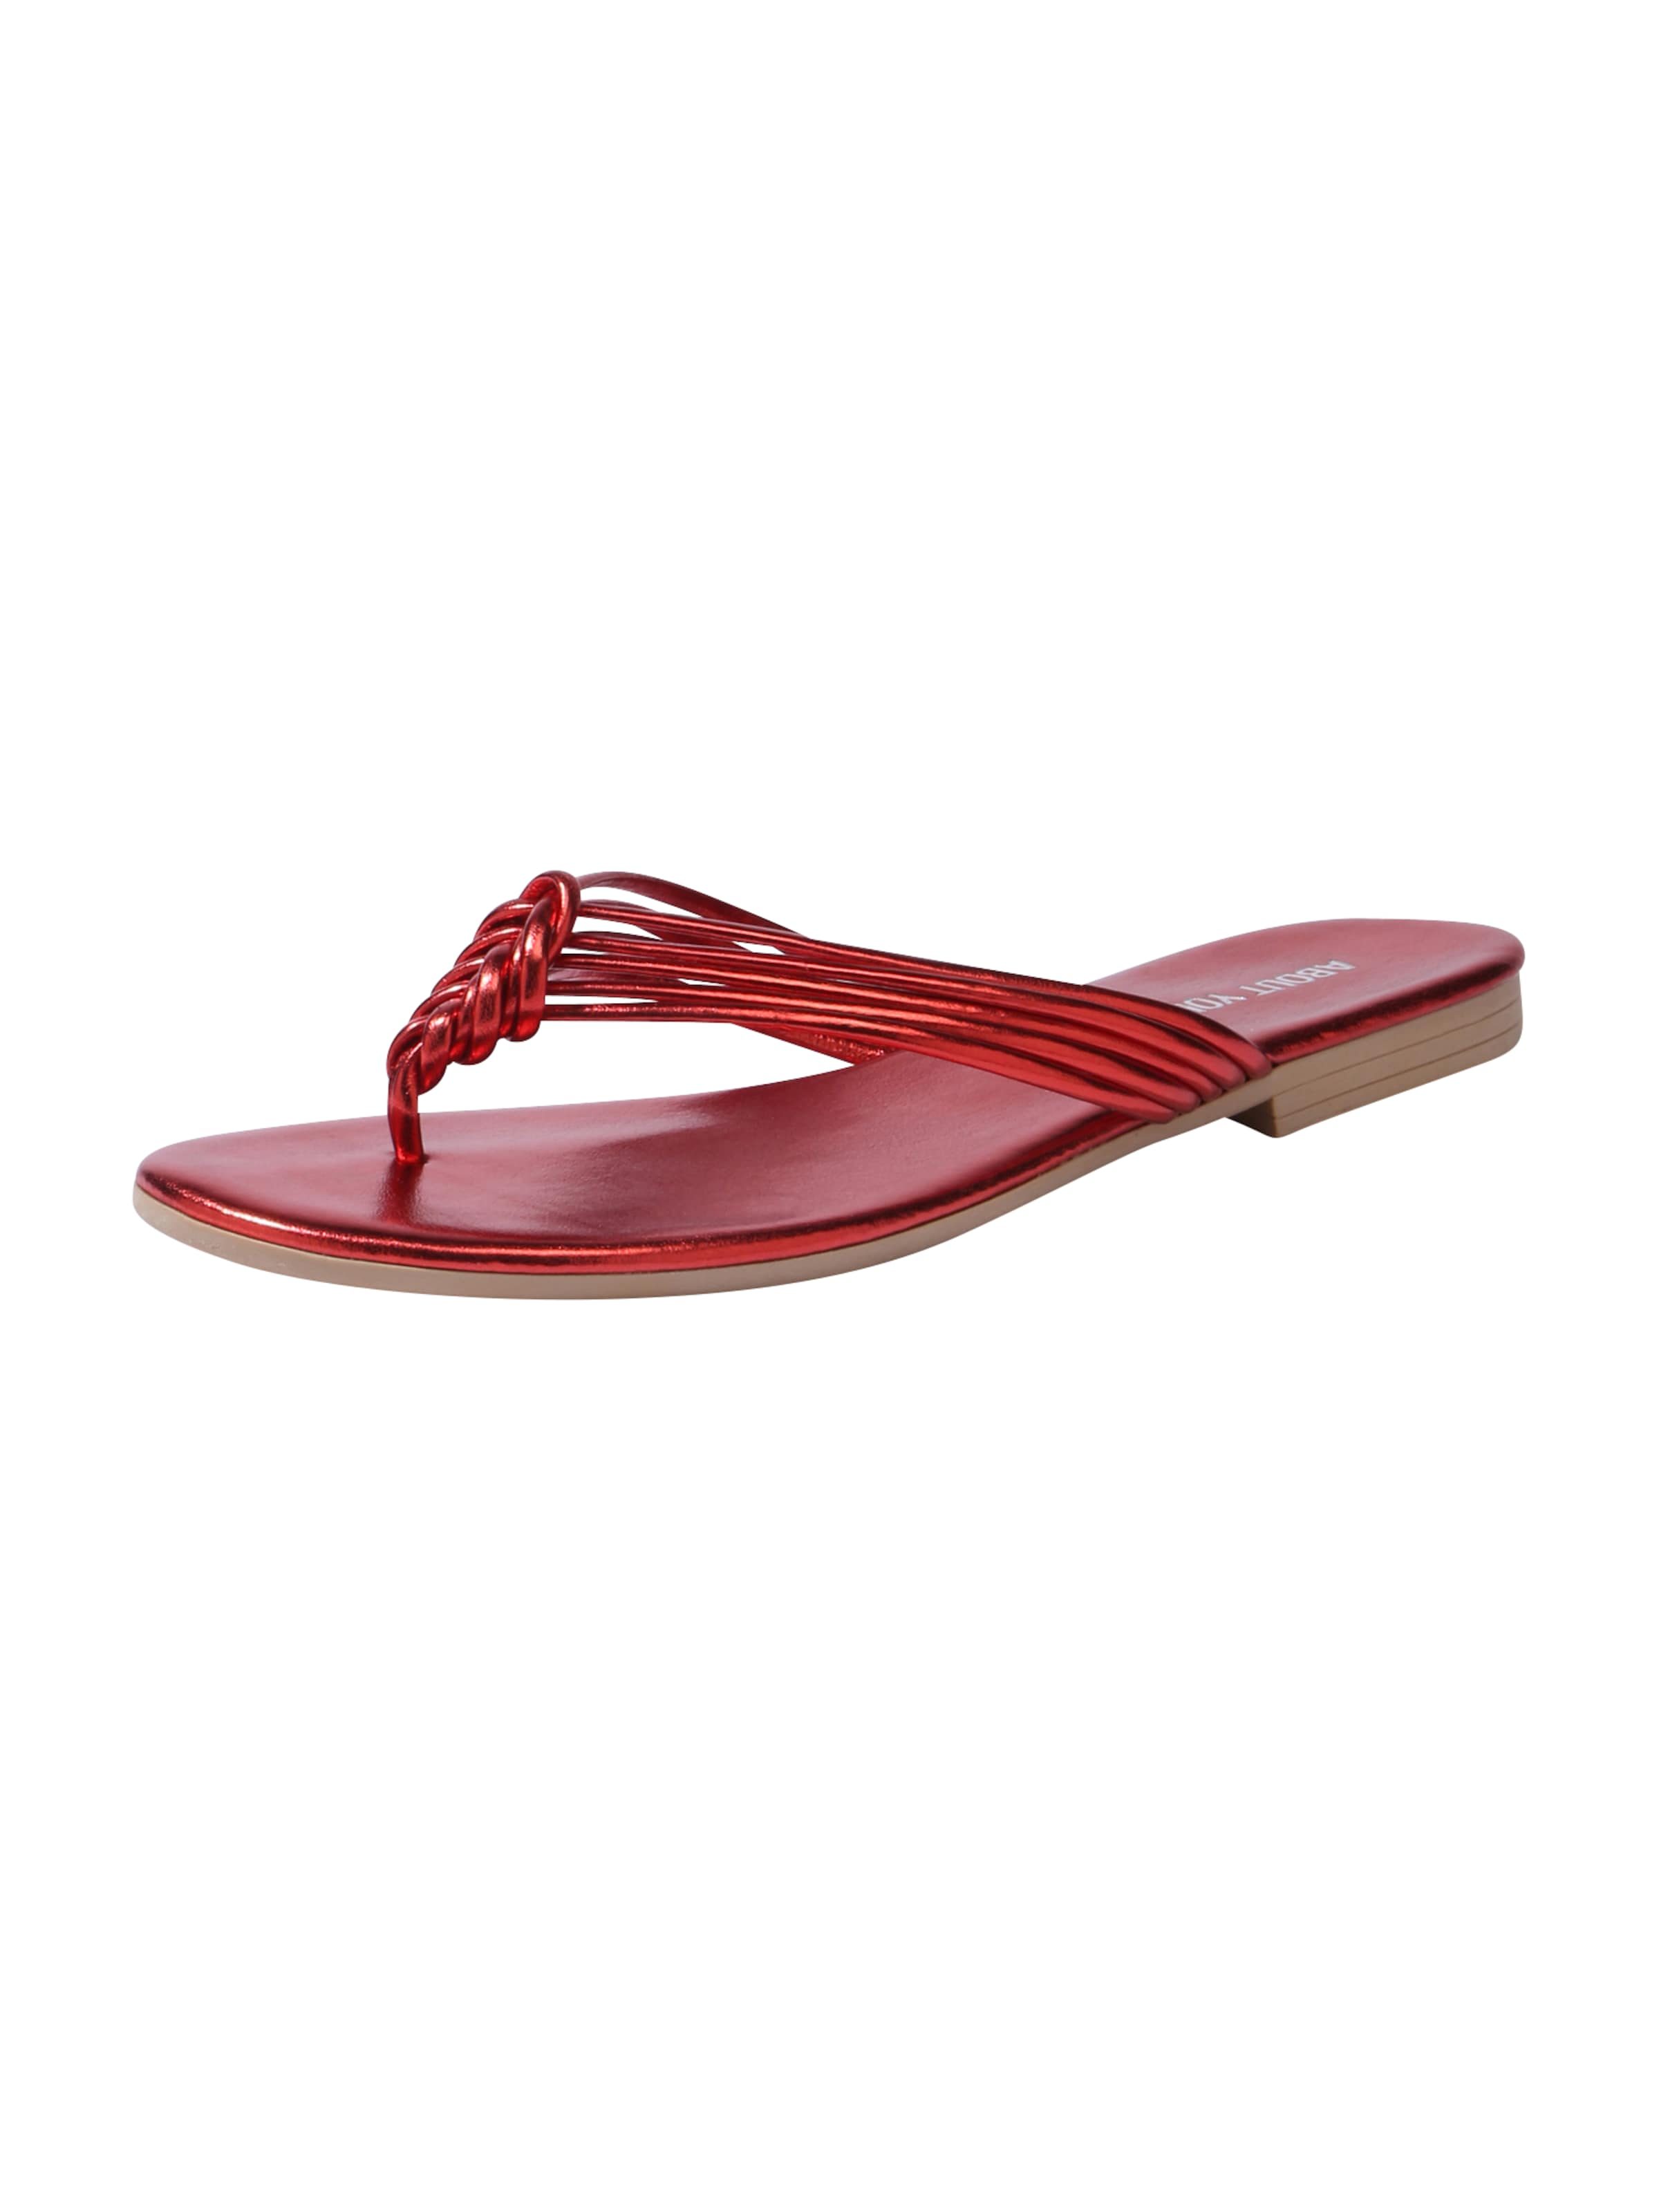 Haltbare 'LEANA' Mode billige Schuhe Sandalen 'LEANA' Haltbare Schuhe Gut getragene Schuhe b87359